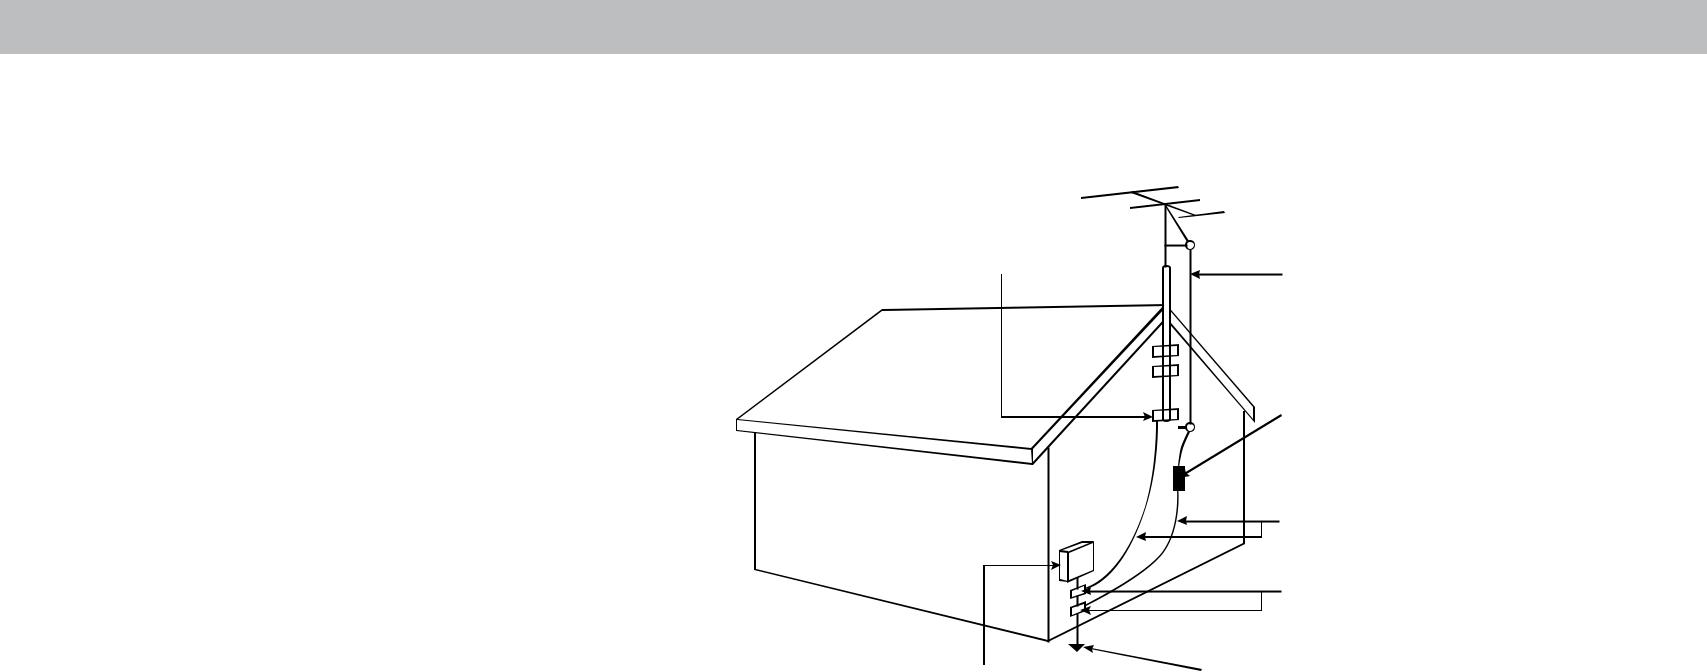 Vizio M657-G0, M557-G0 User Manual